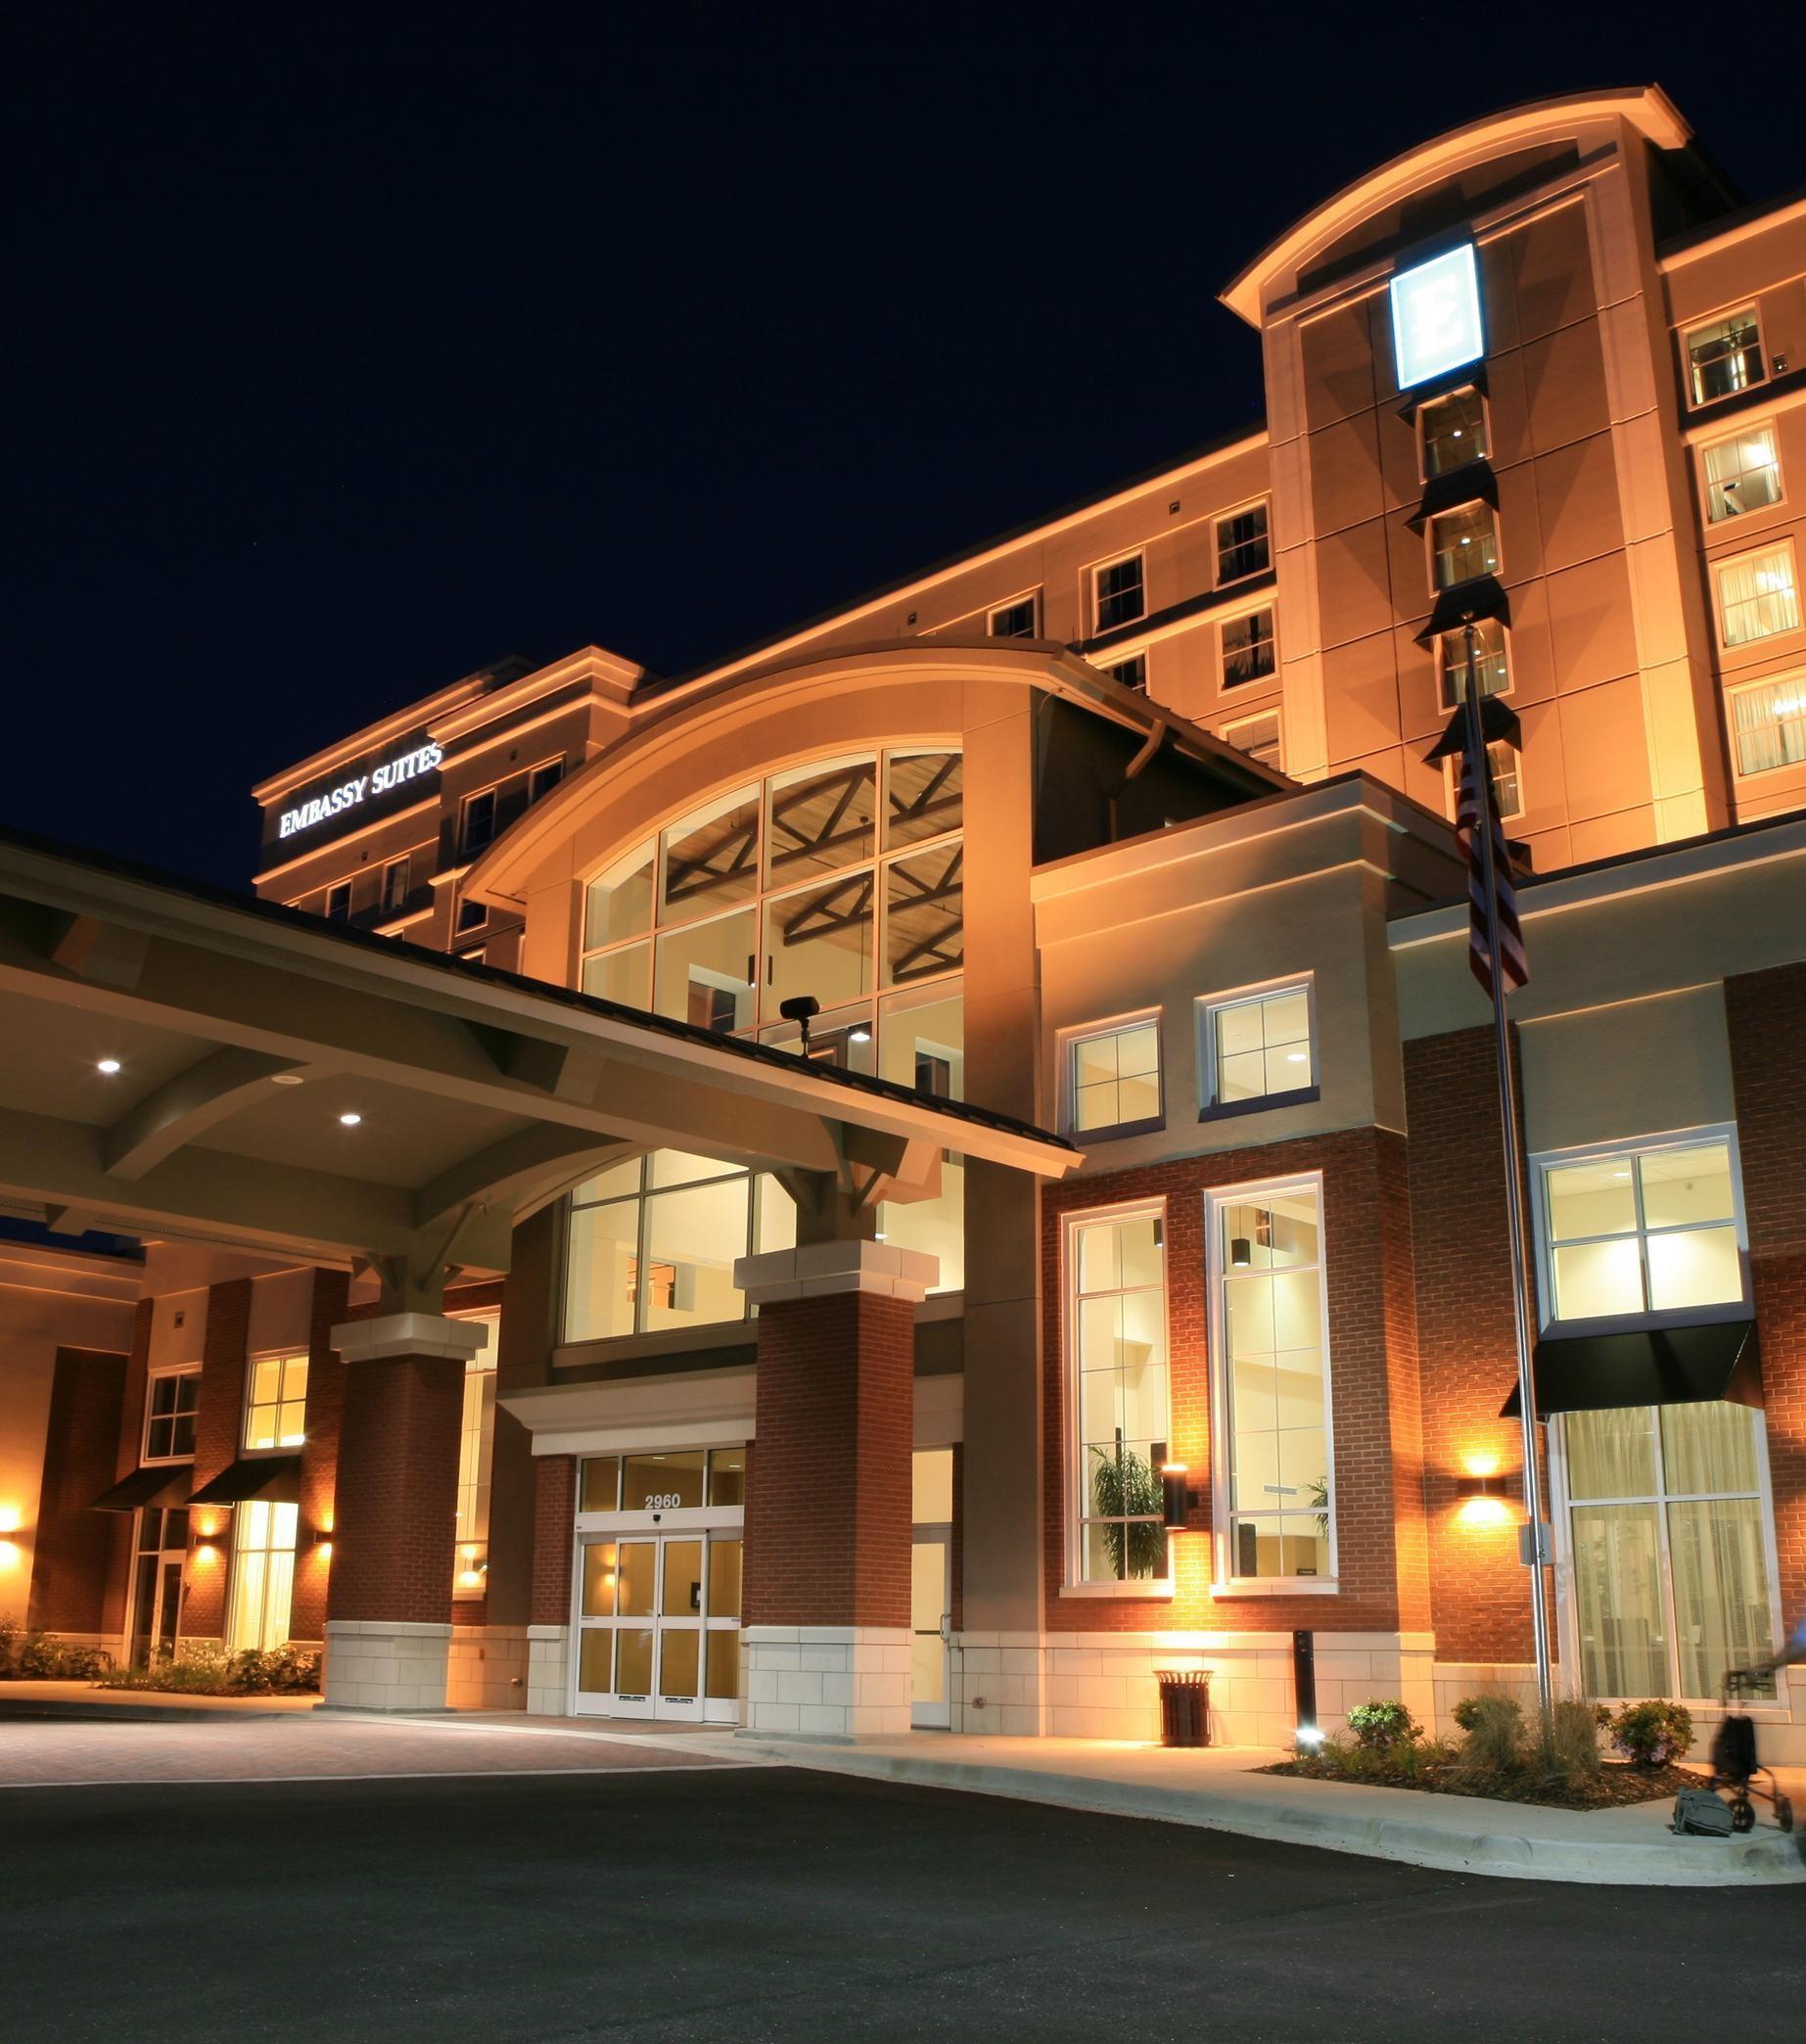 Embassy Suites by Hilton Birmingham Hoover image 0